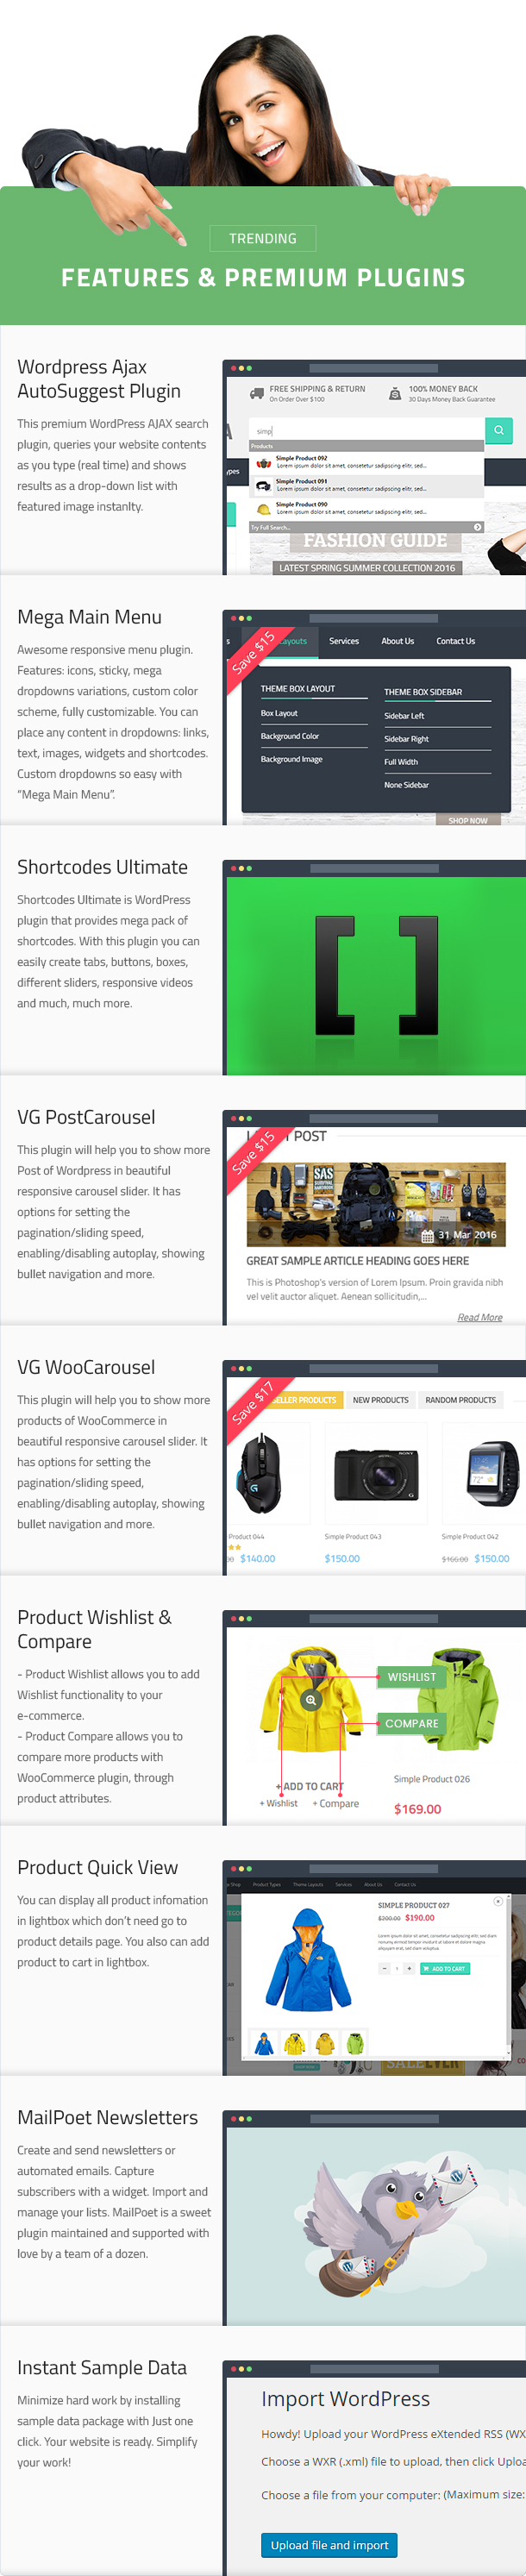 VG Sagitta - Responsives WordPress-Template für Mega Store - 17